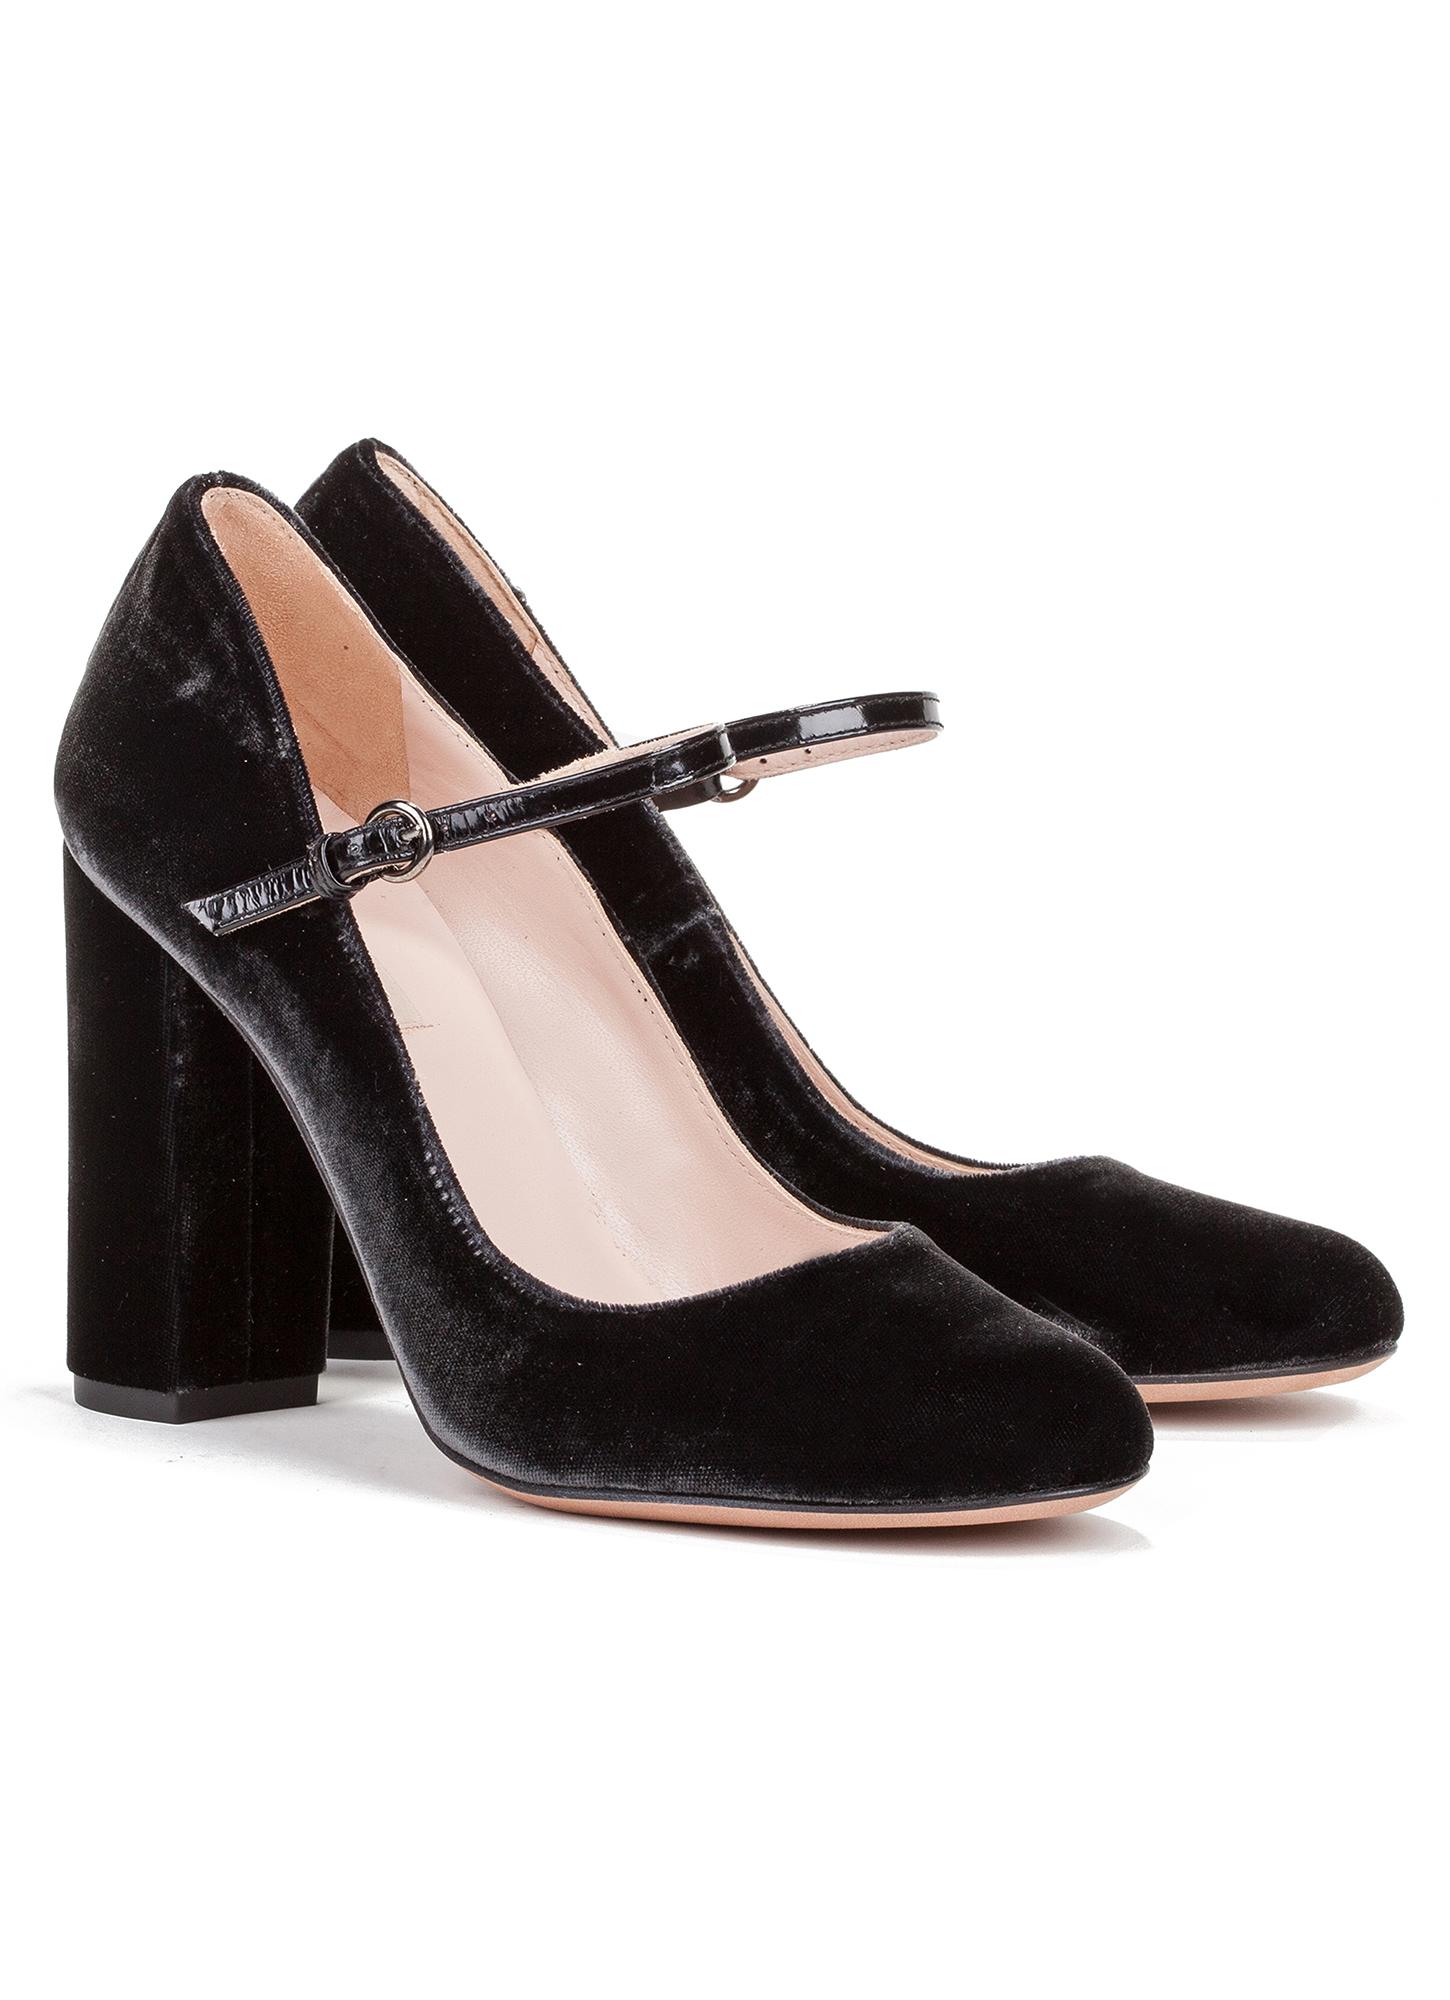 Zapatos de tacón forrados de terciopelo con hebilla gris 35 fgU4Id